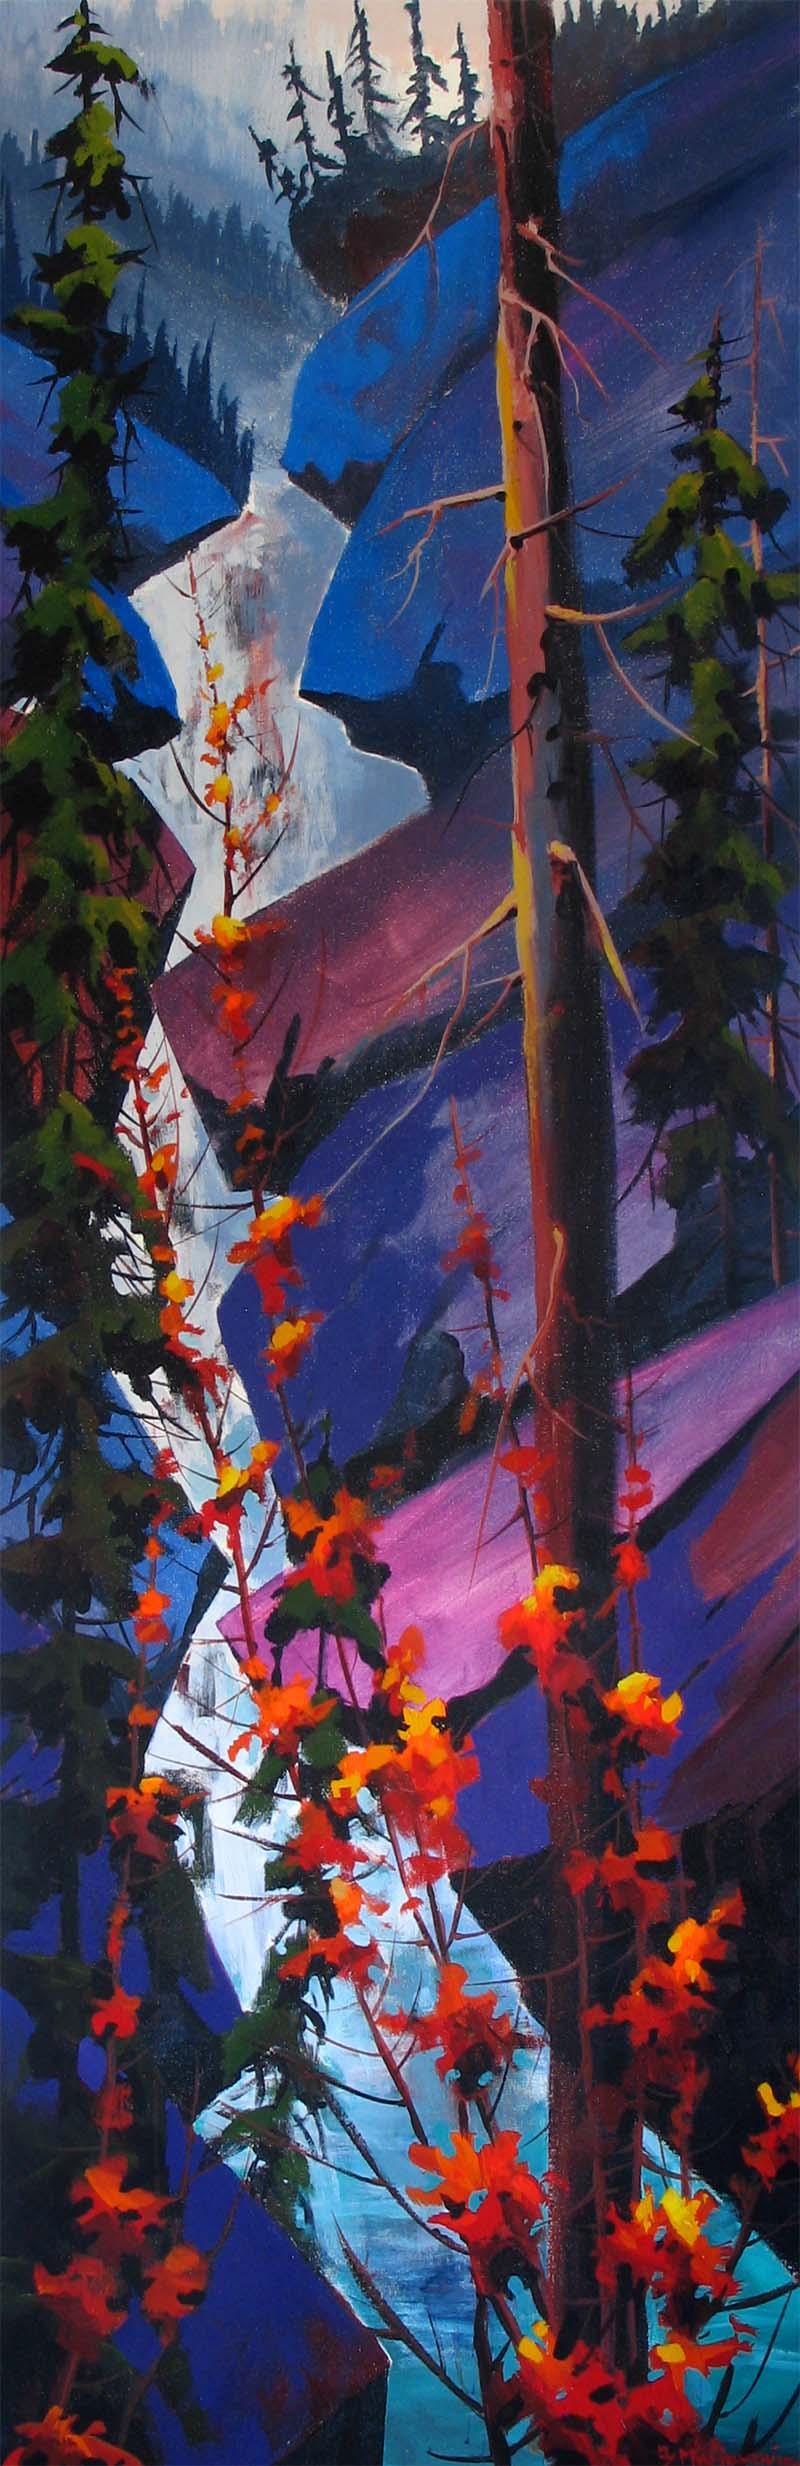 Coming Down the Johnston Canyon - Branko Marjanovic